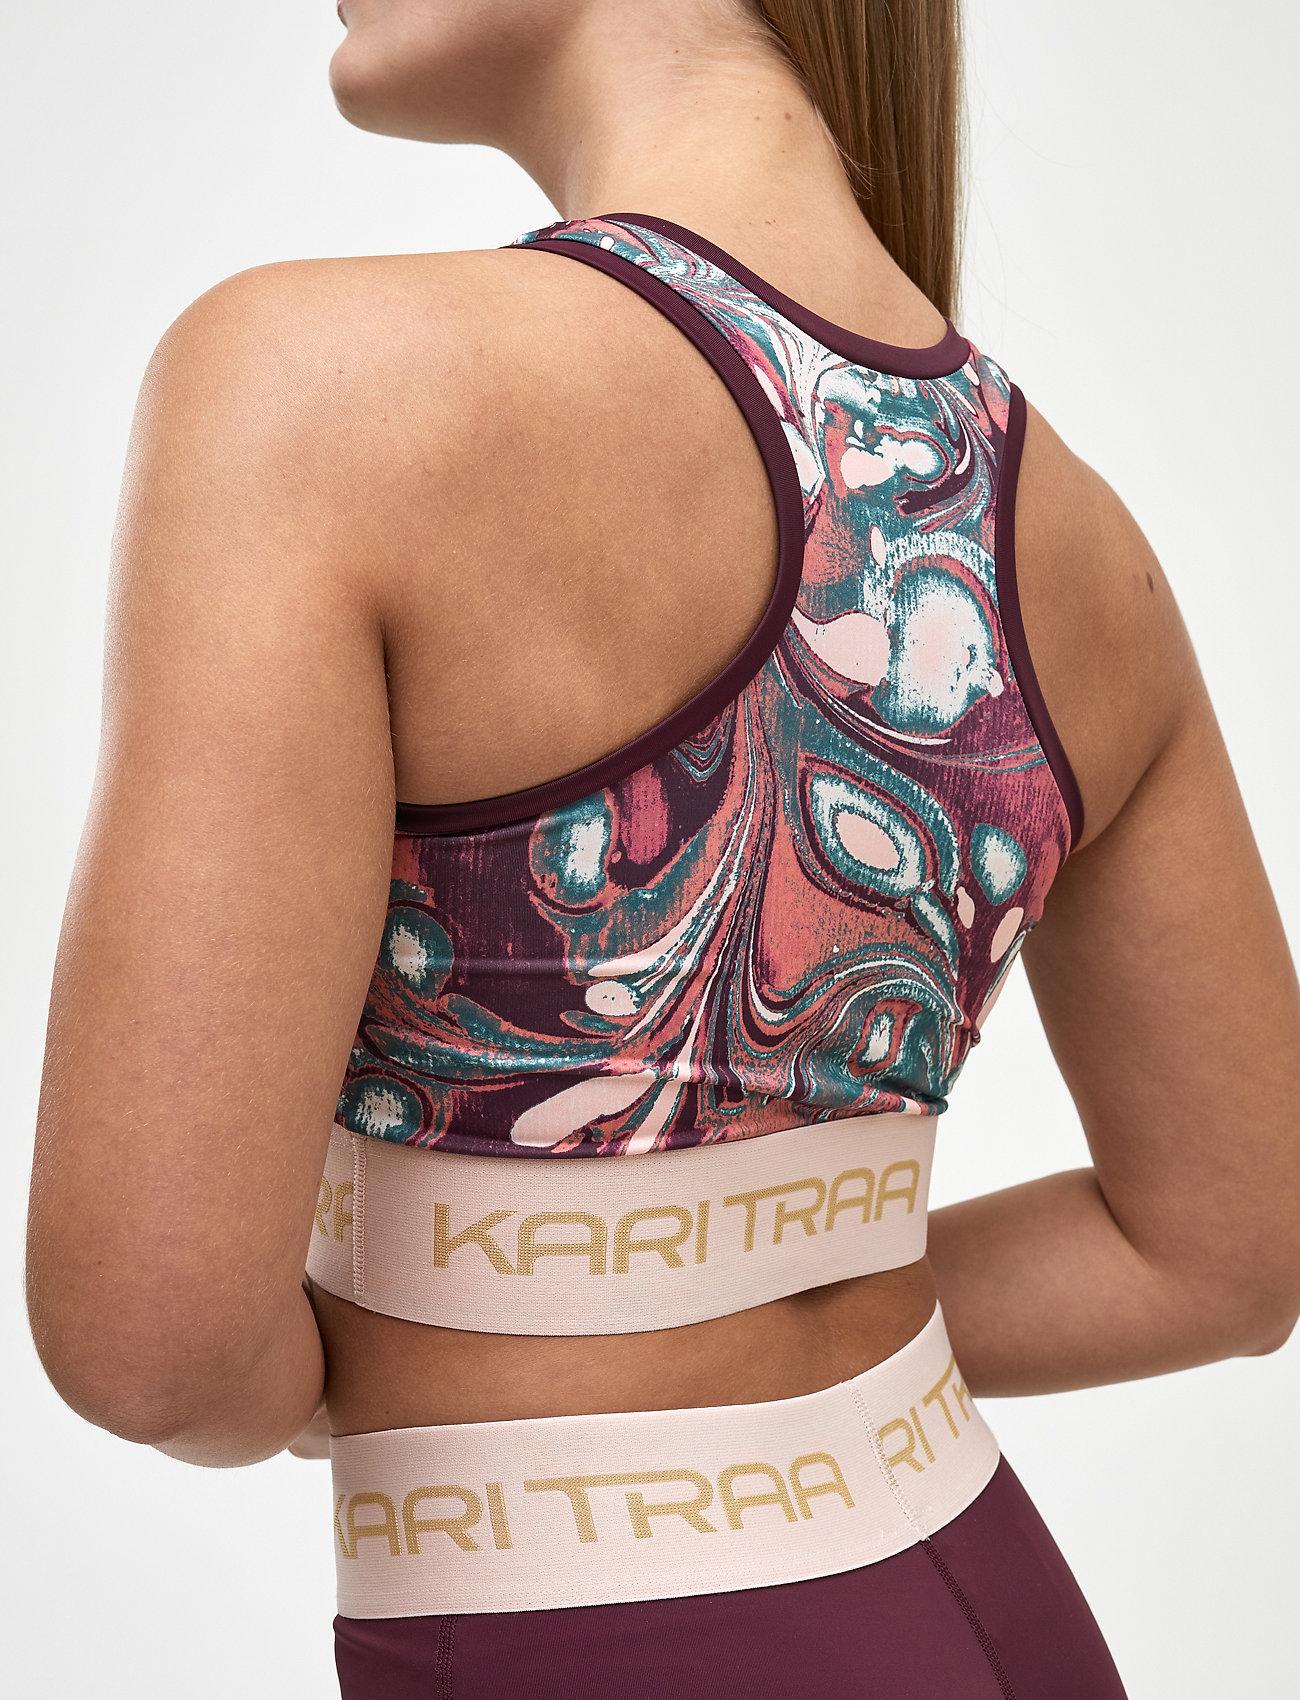 Kari Traa BEATRICE TOP - T-shirts & Toppe FIG - Dametøj Særtilbud